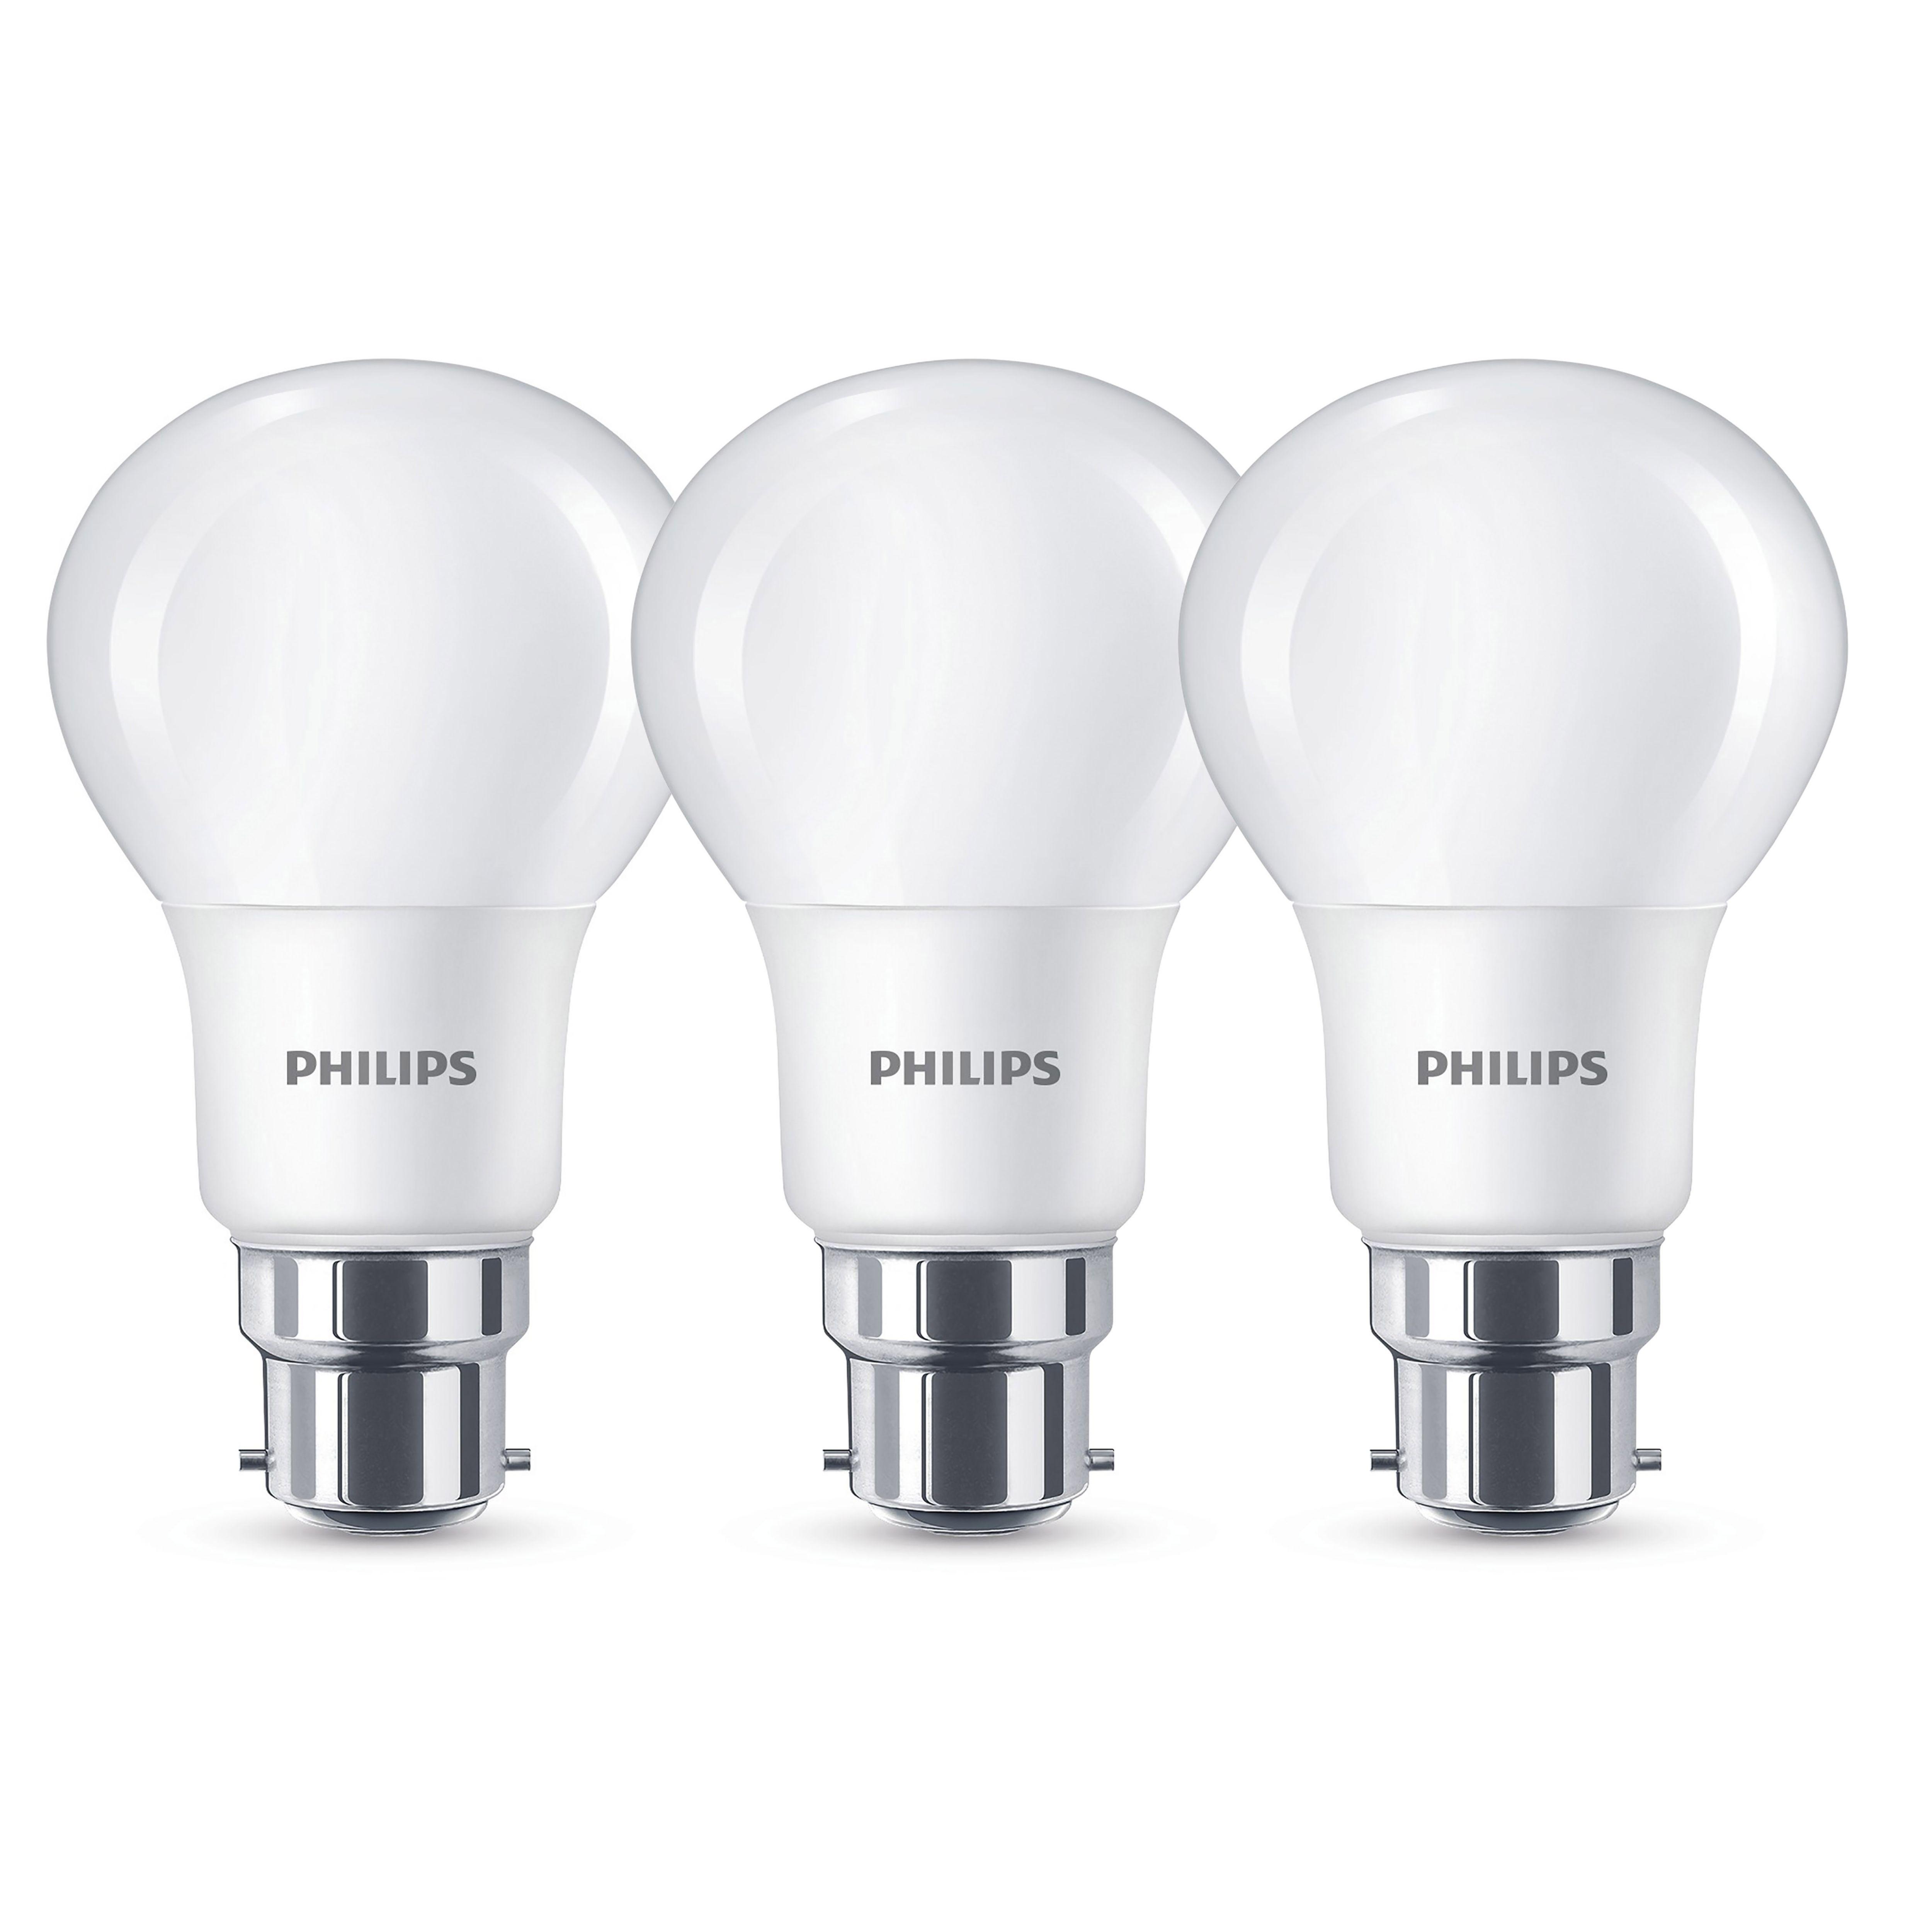 Philips B22 1521lm Led Gls Light Bulb, Pack Of 3